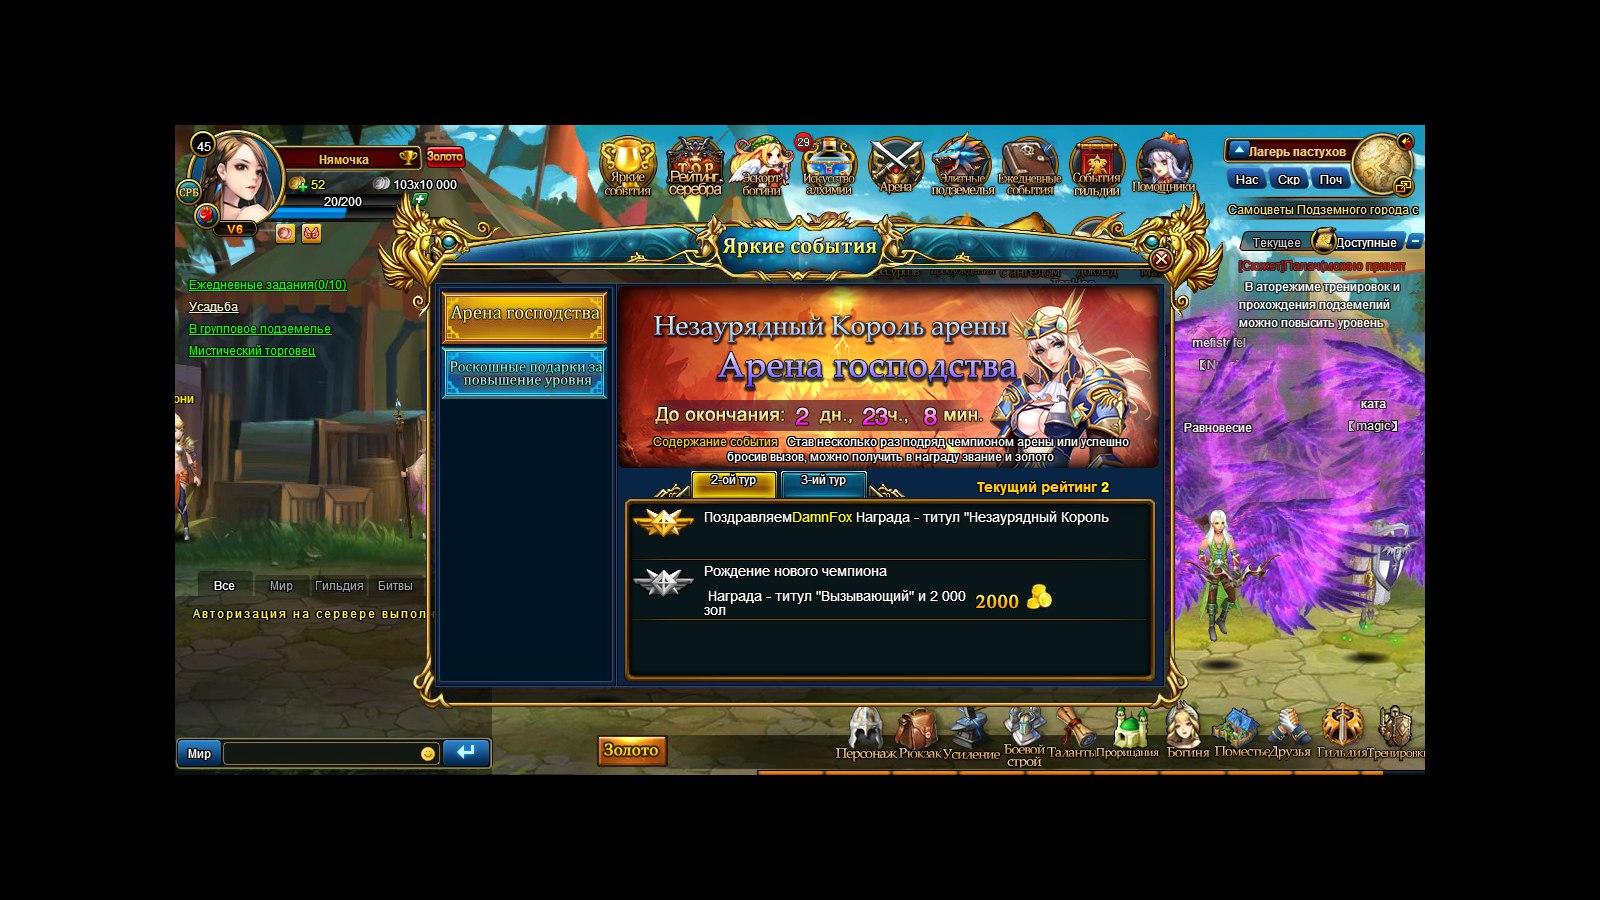 Скриншот с наградами за Арену